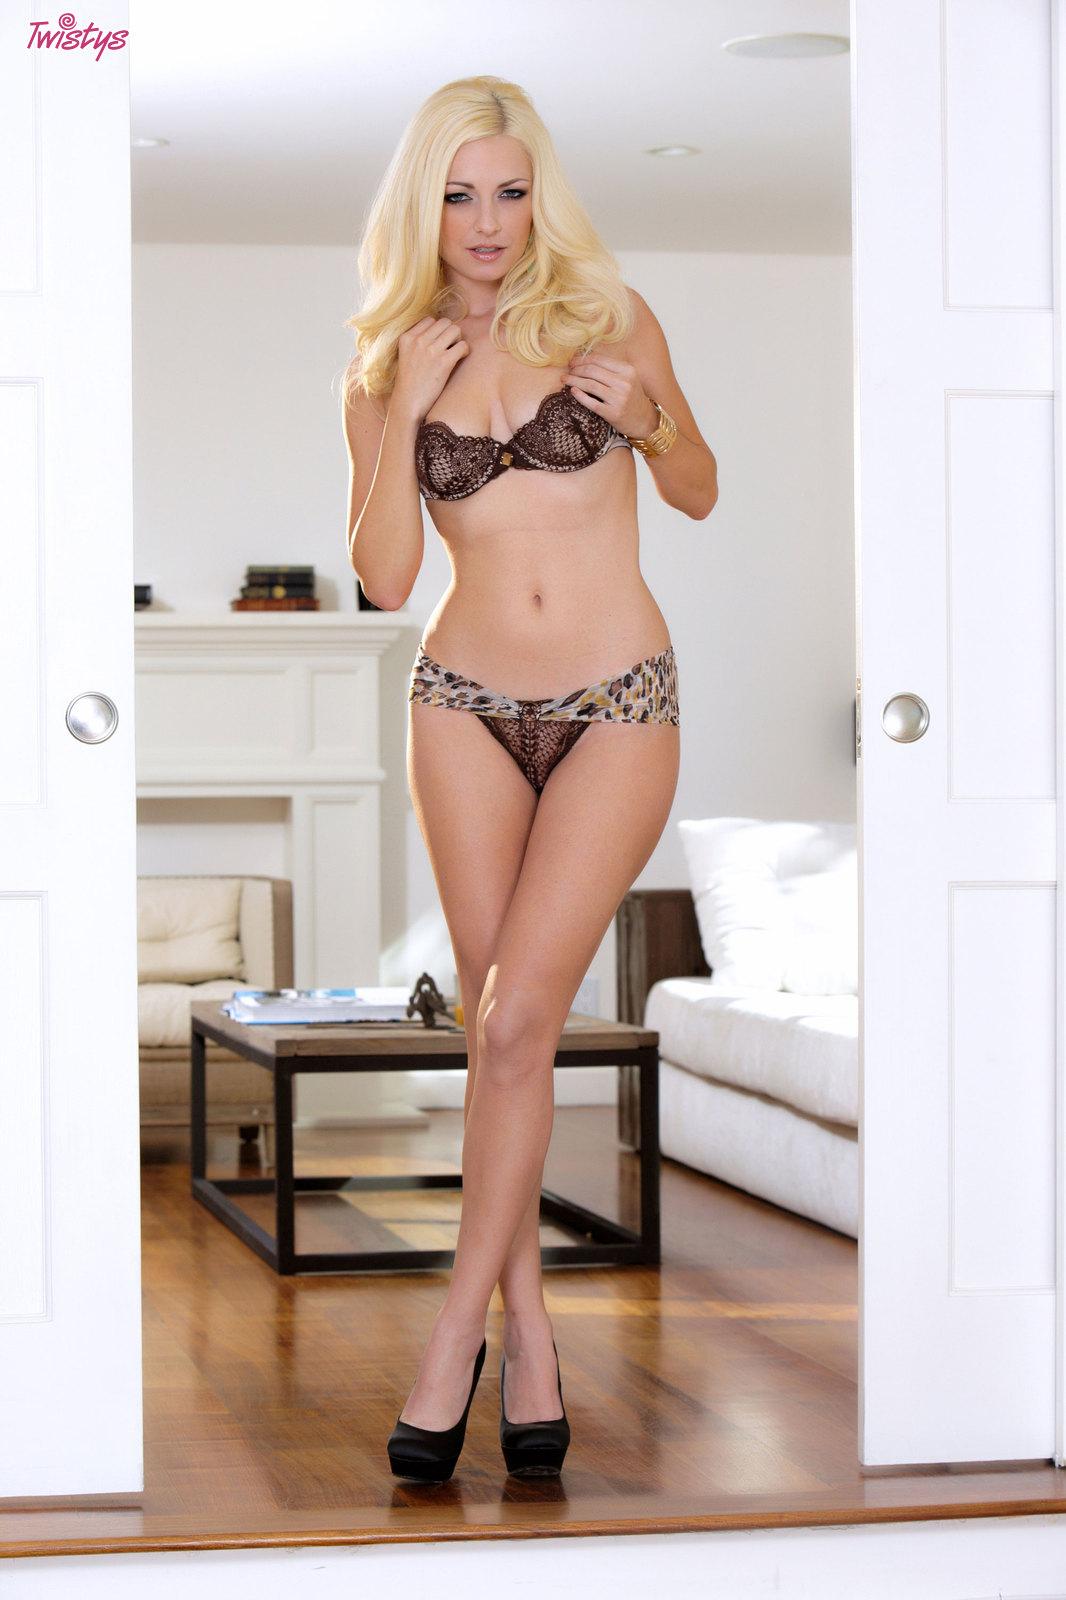 Danielle Trixie in lingerie